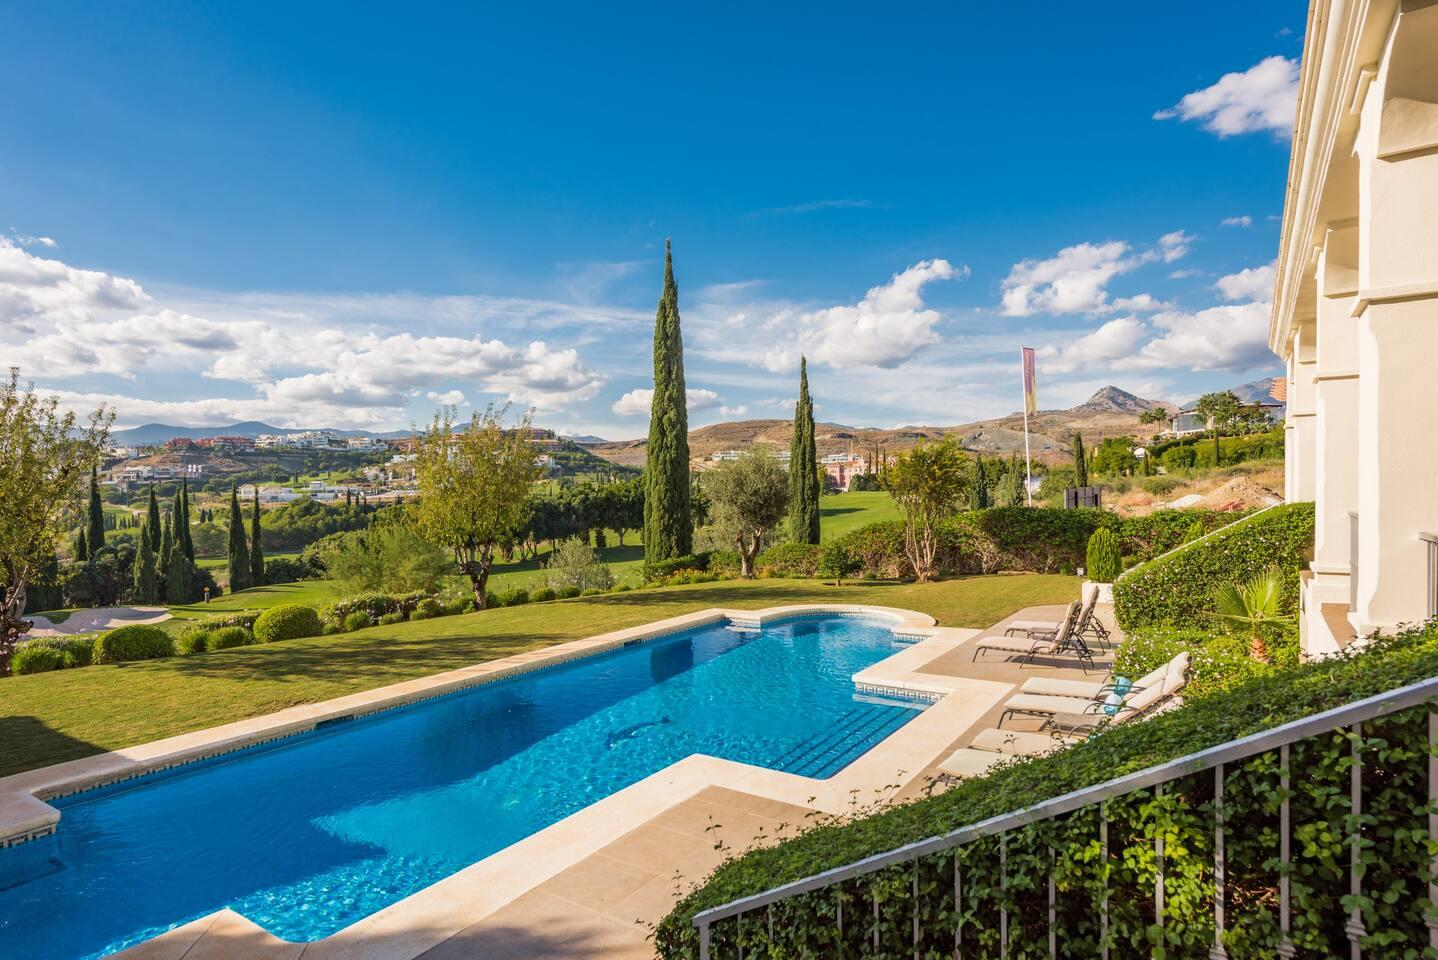 Swimming pool & views Piscina y vistas